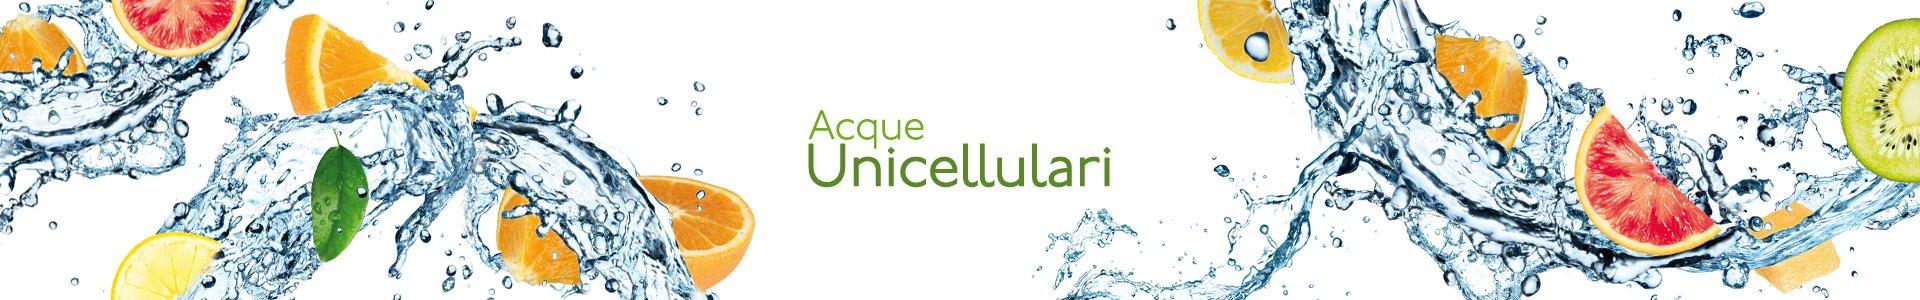 Acqua Unicellulare linee viso Nature's